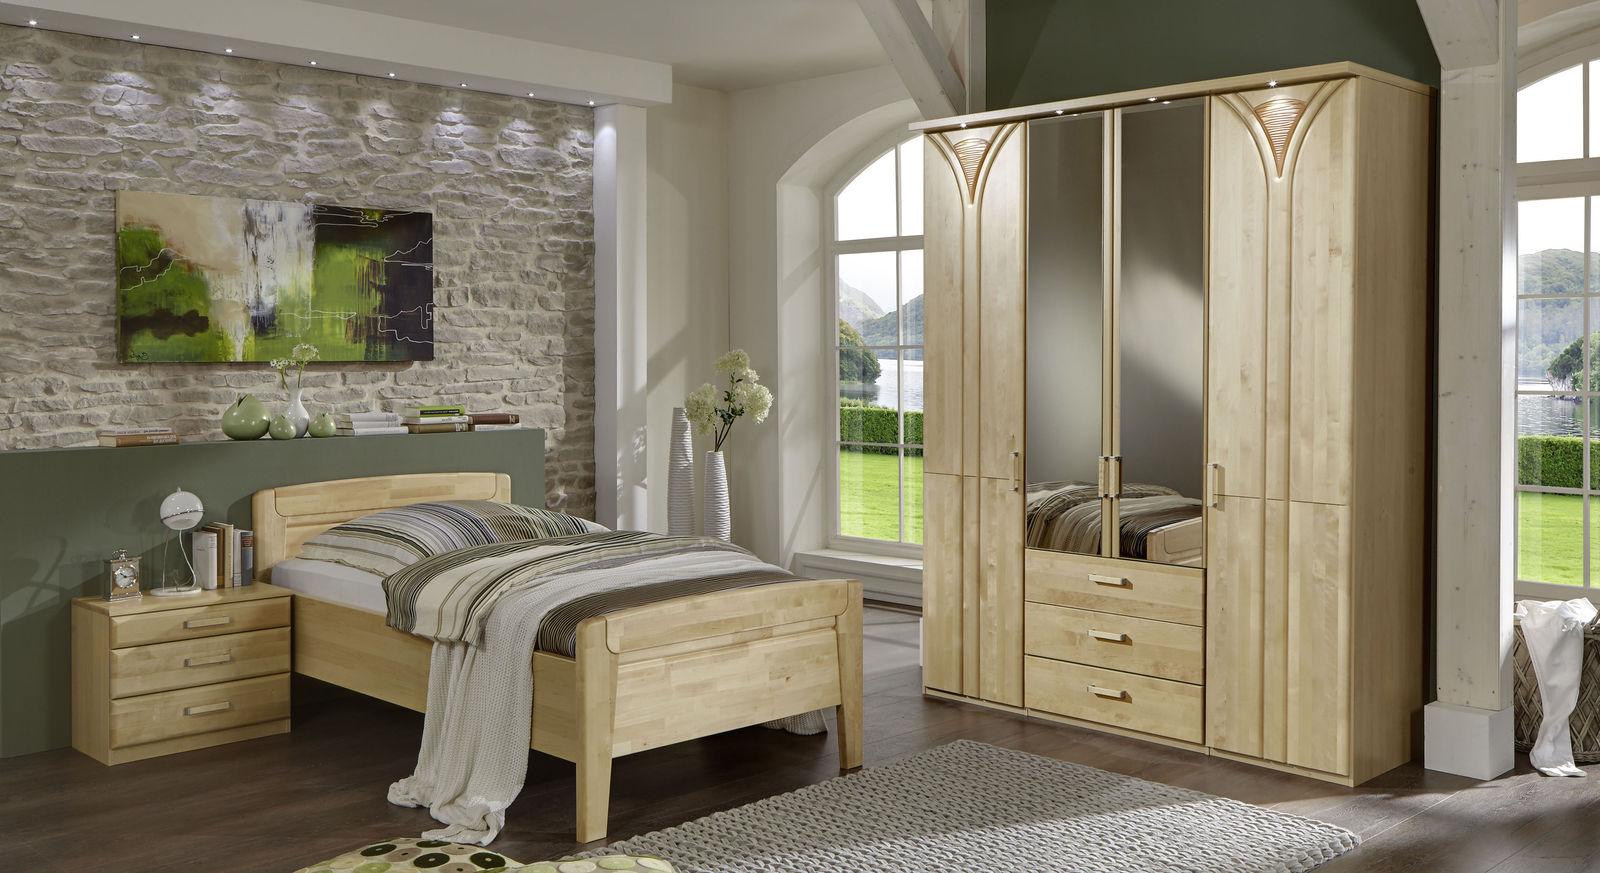 seniorengerechtes schlafzimmer komplett birke teilmassiv tonga. Black Bedroom Furniture Sets. Home Design Ideas